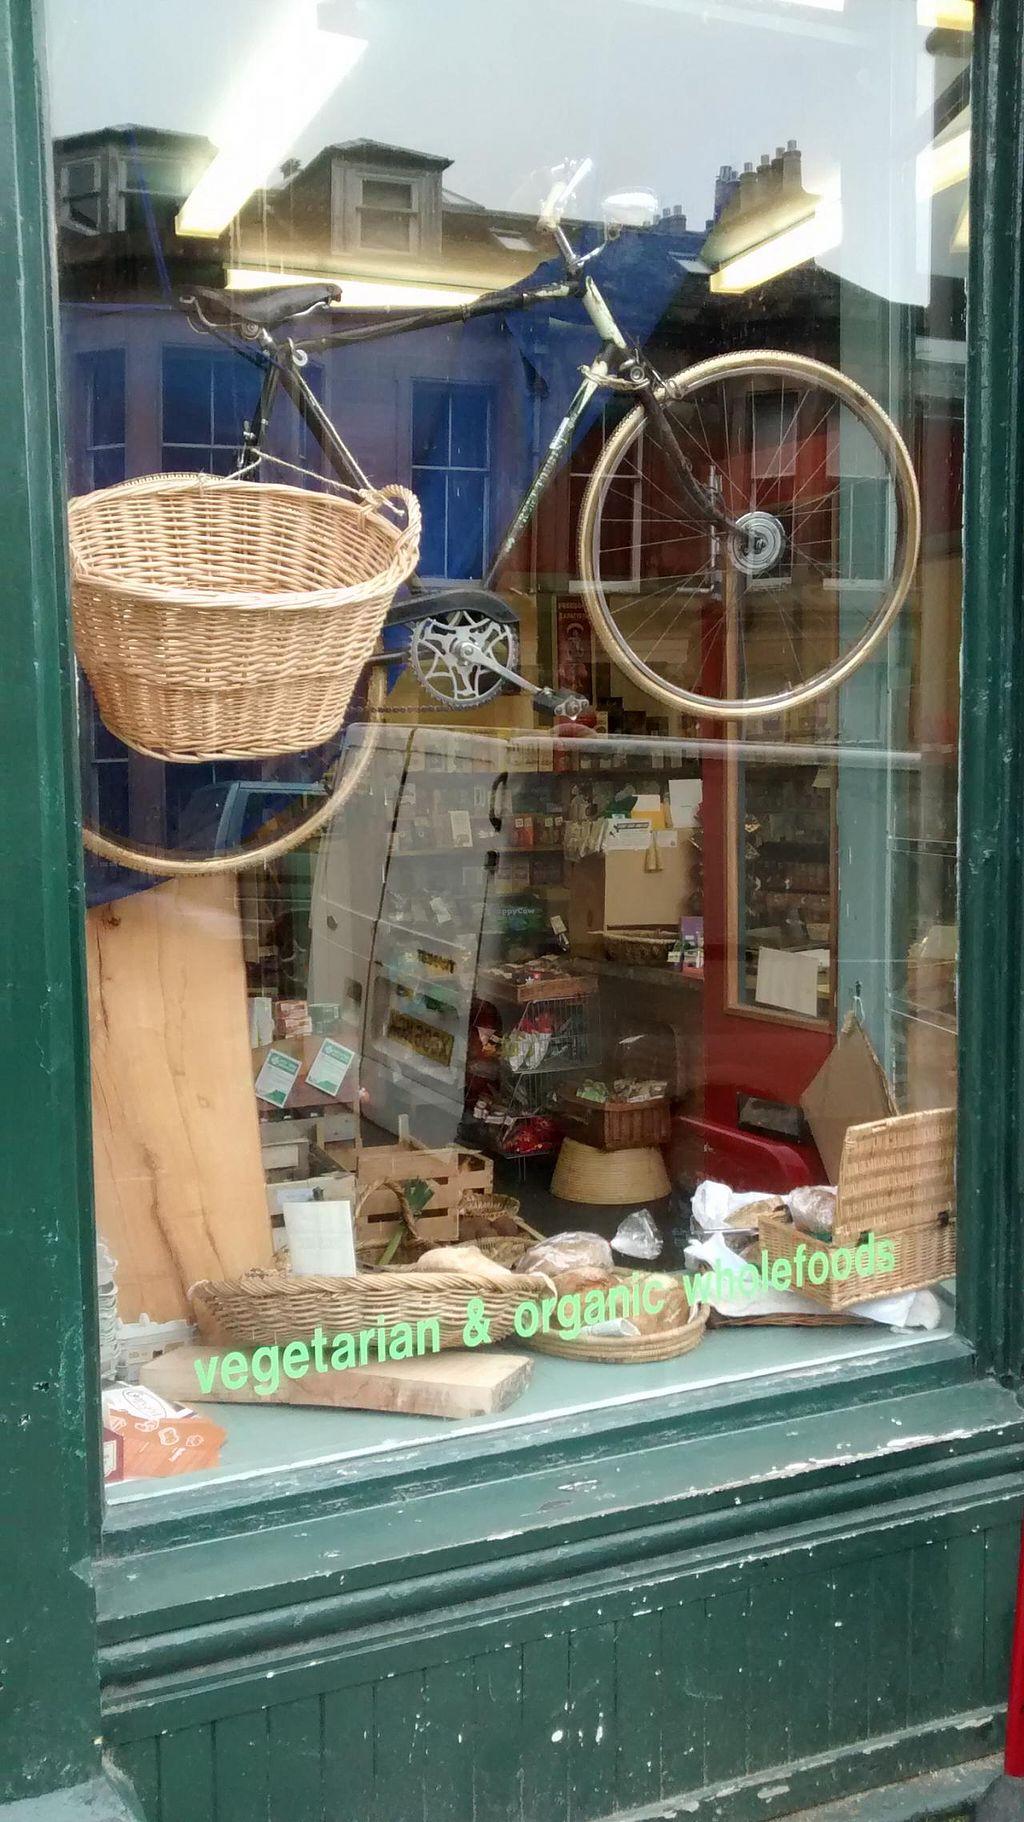 The New Leaf Co-op - Edinburgh Health Store - HappyCow